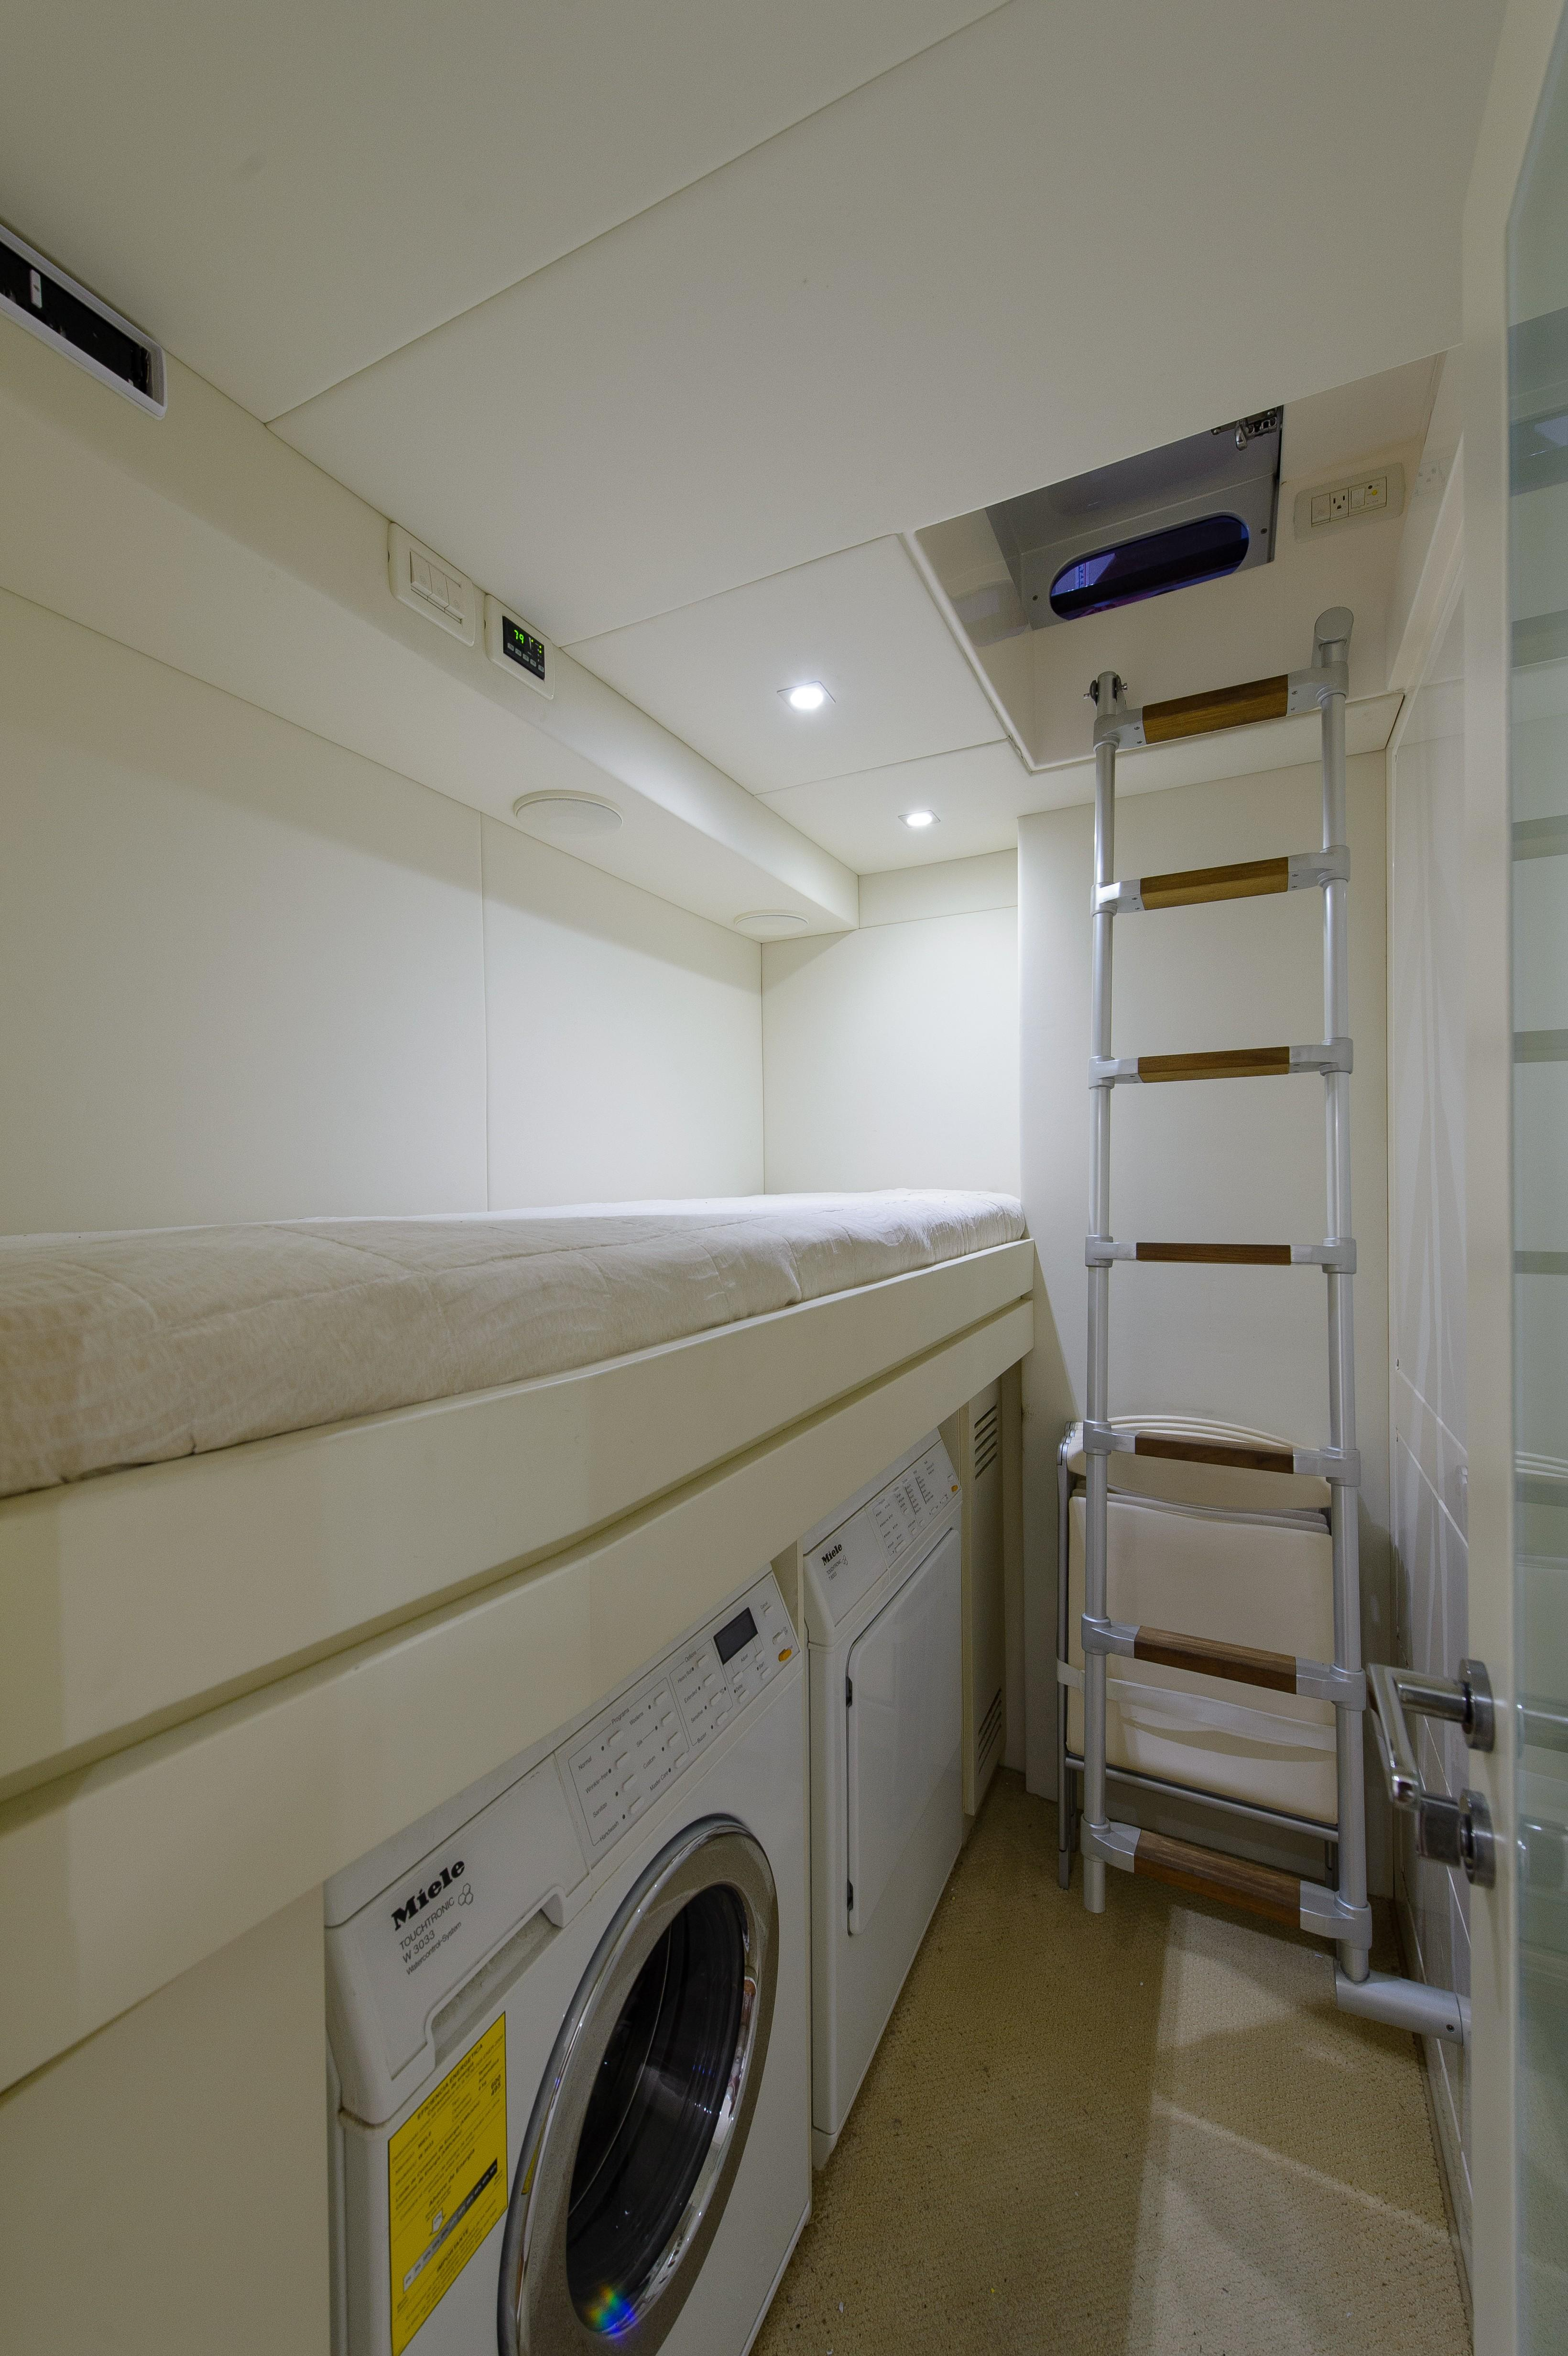 2012 Pershing 64 - Laundry